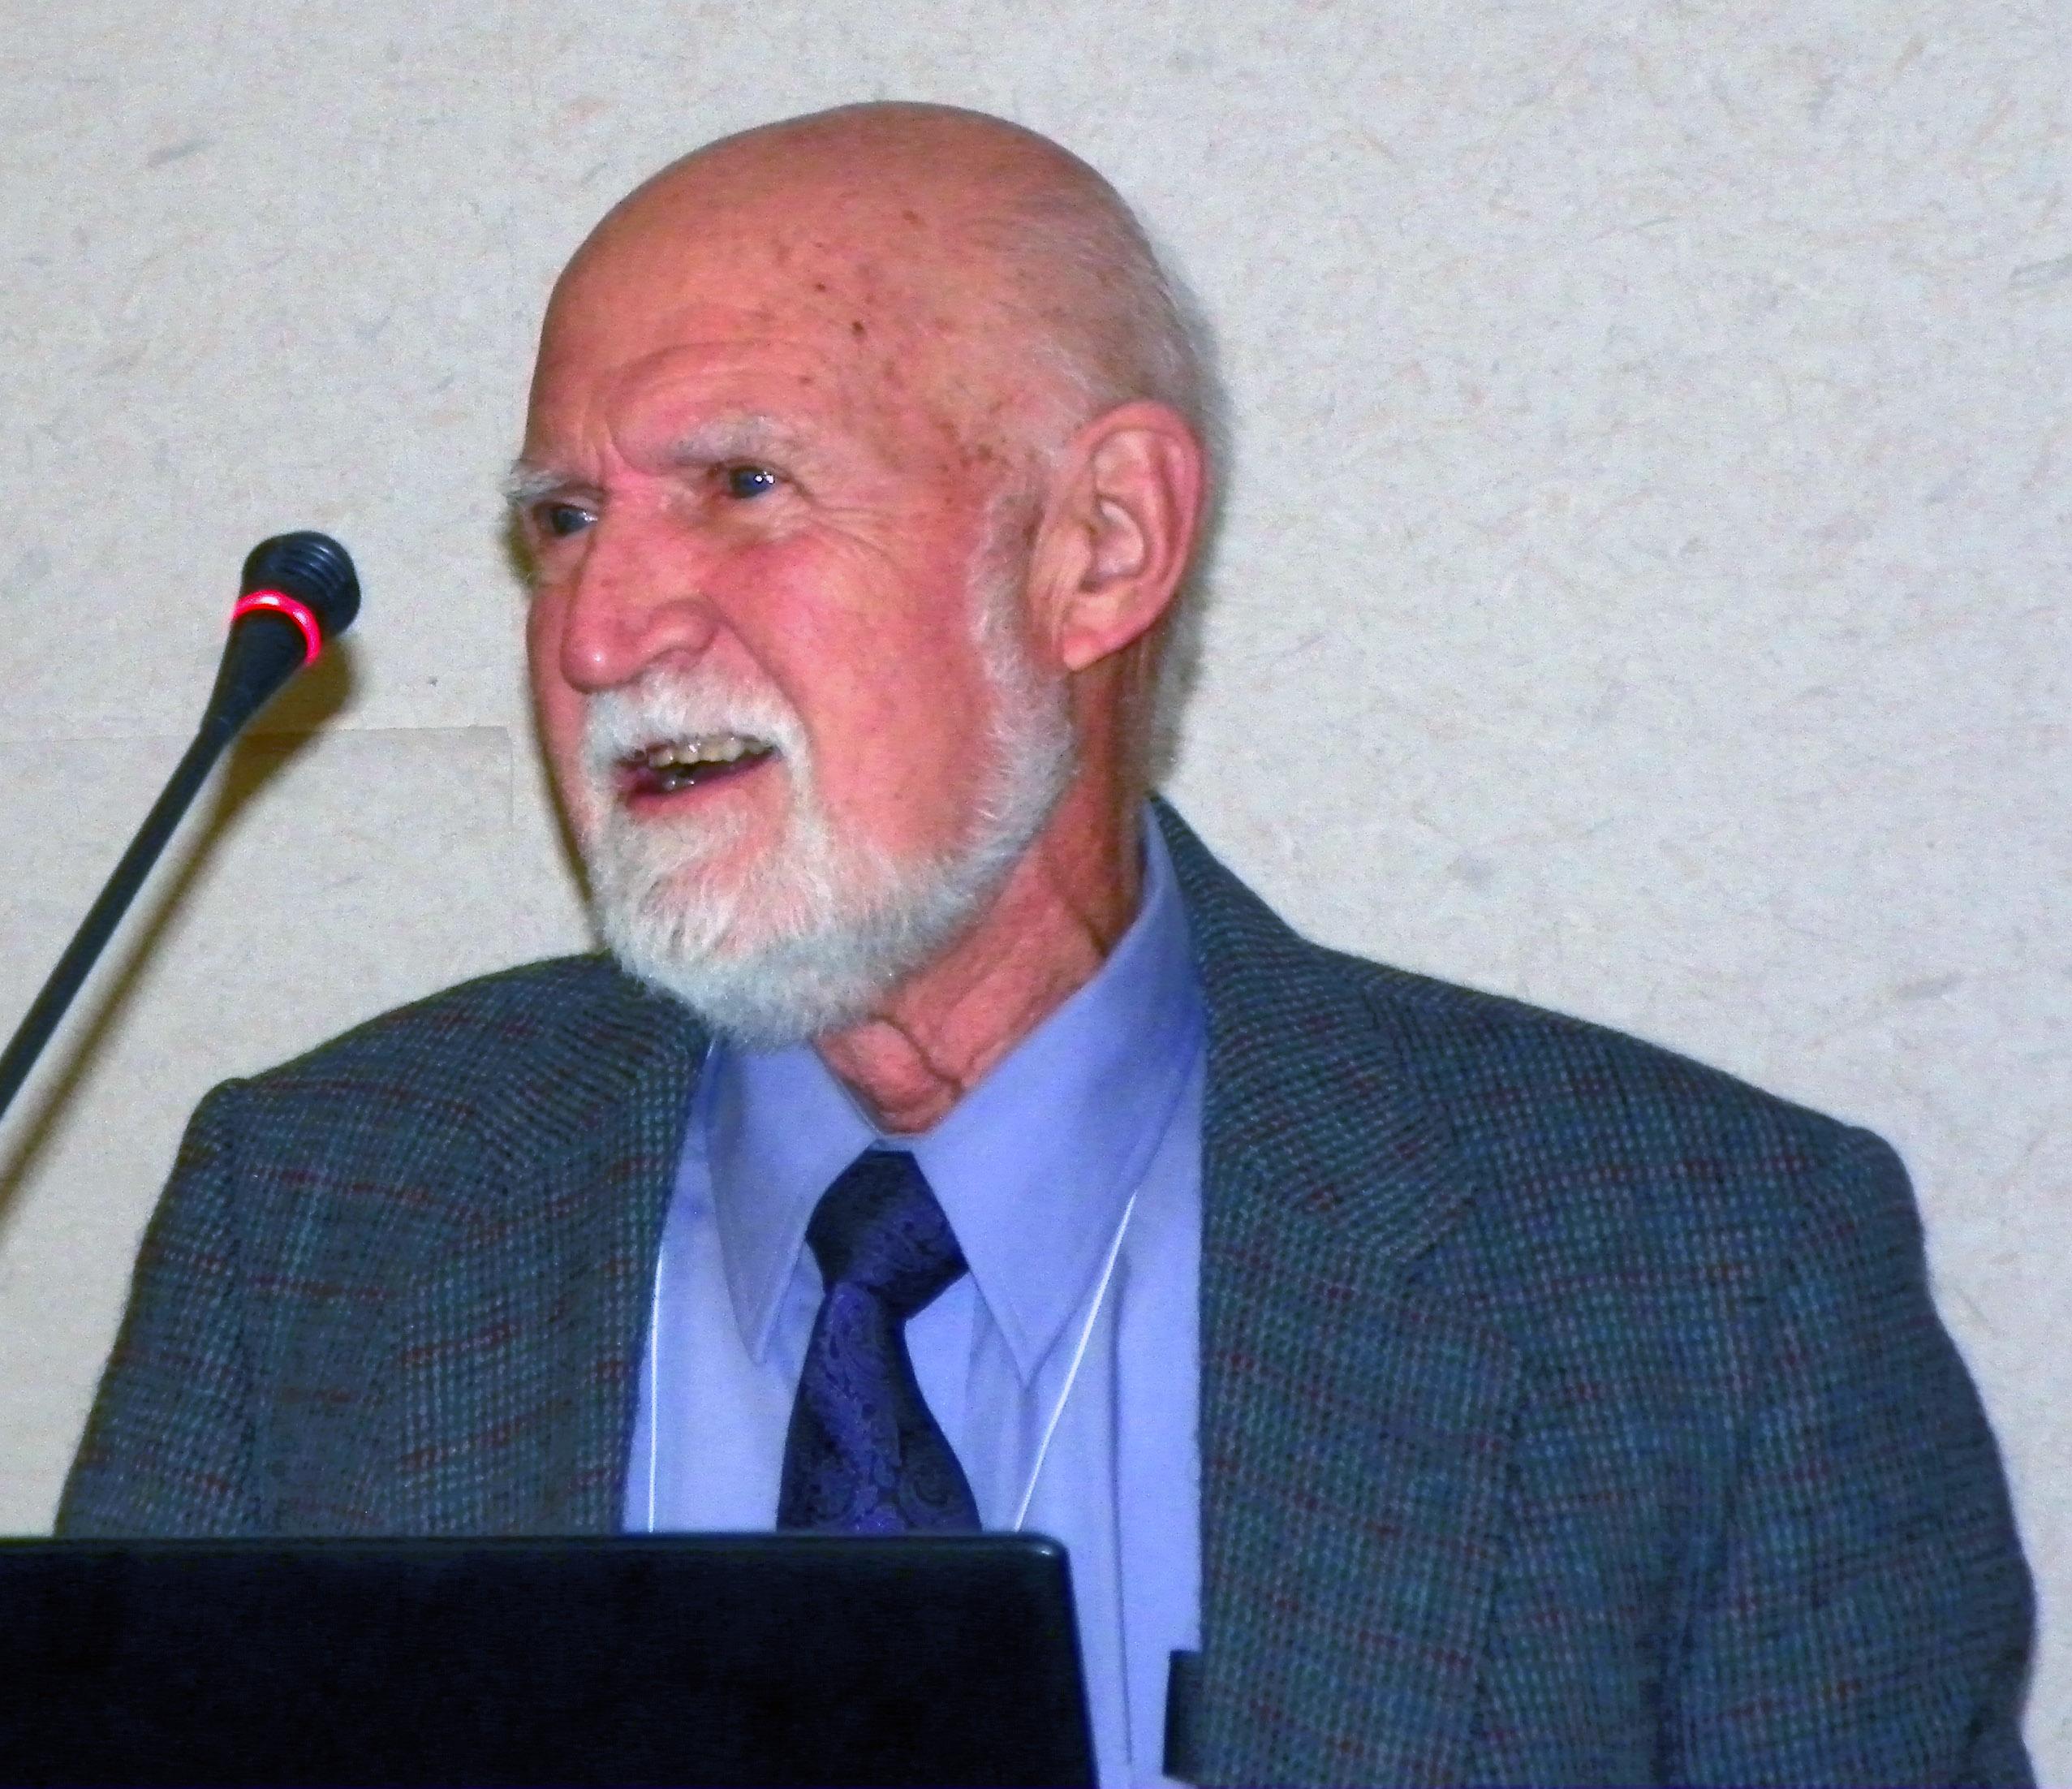 Honorary Member Weldon Thornton